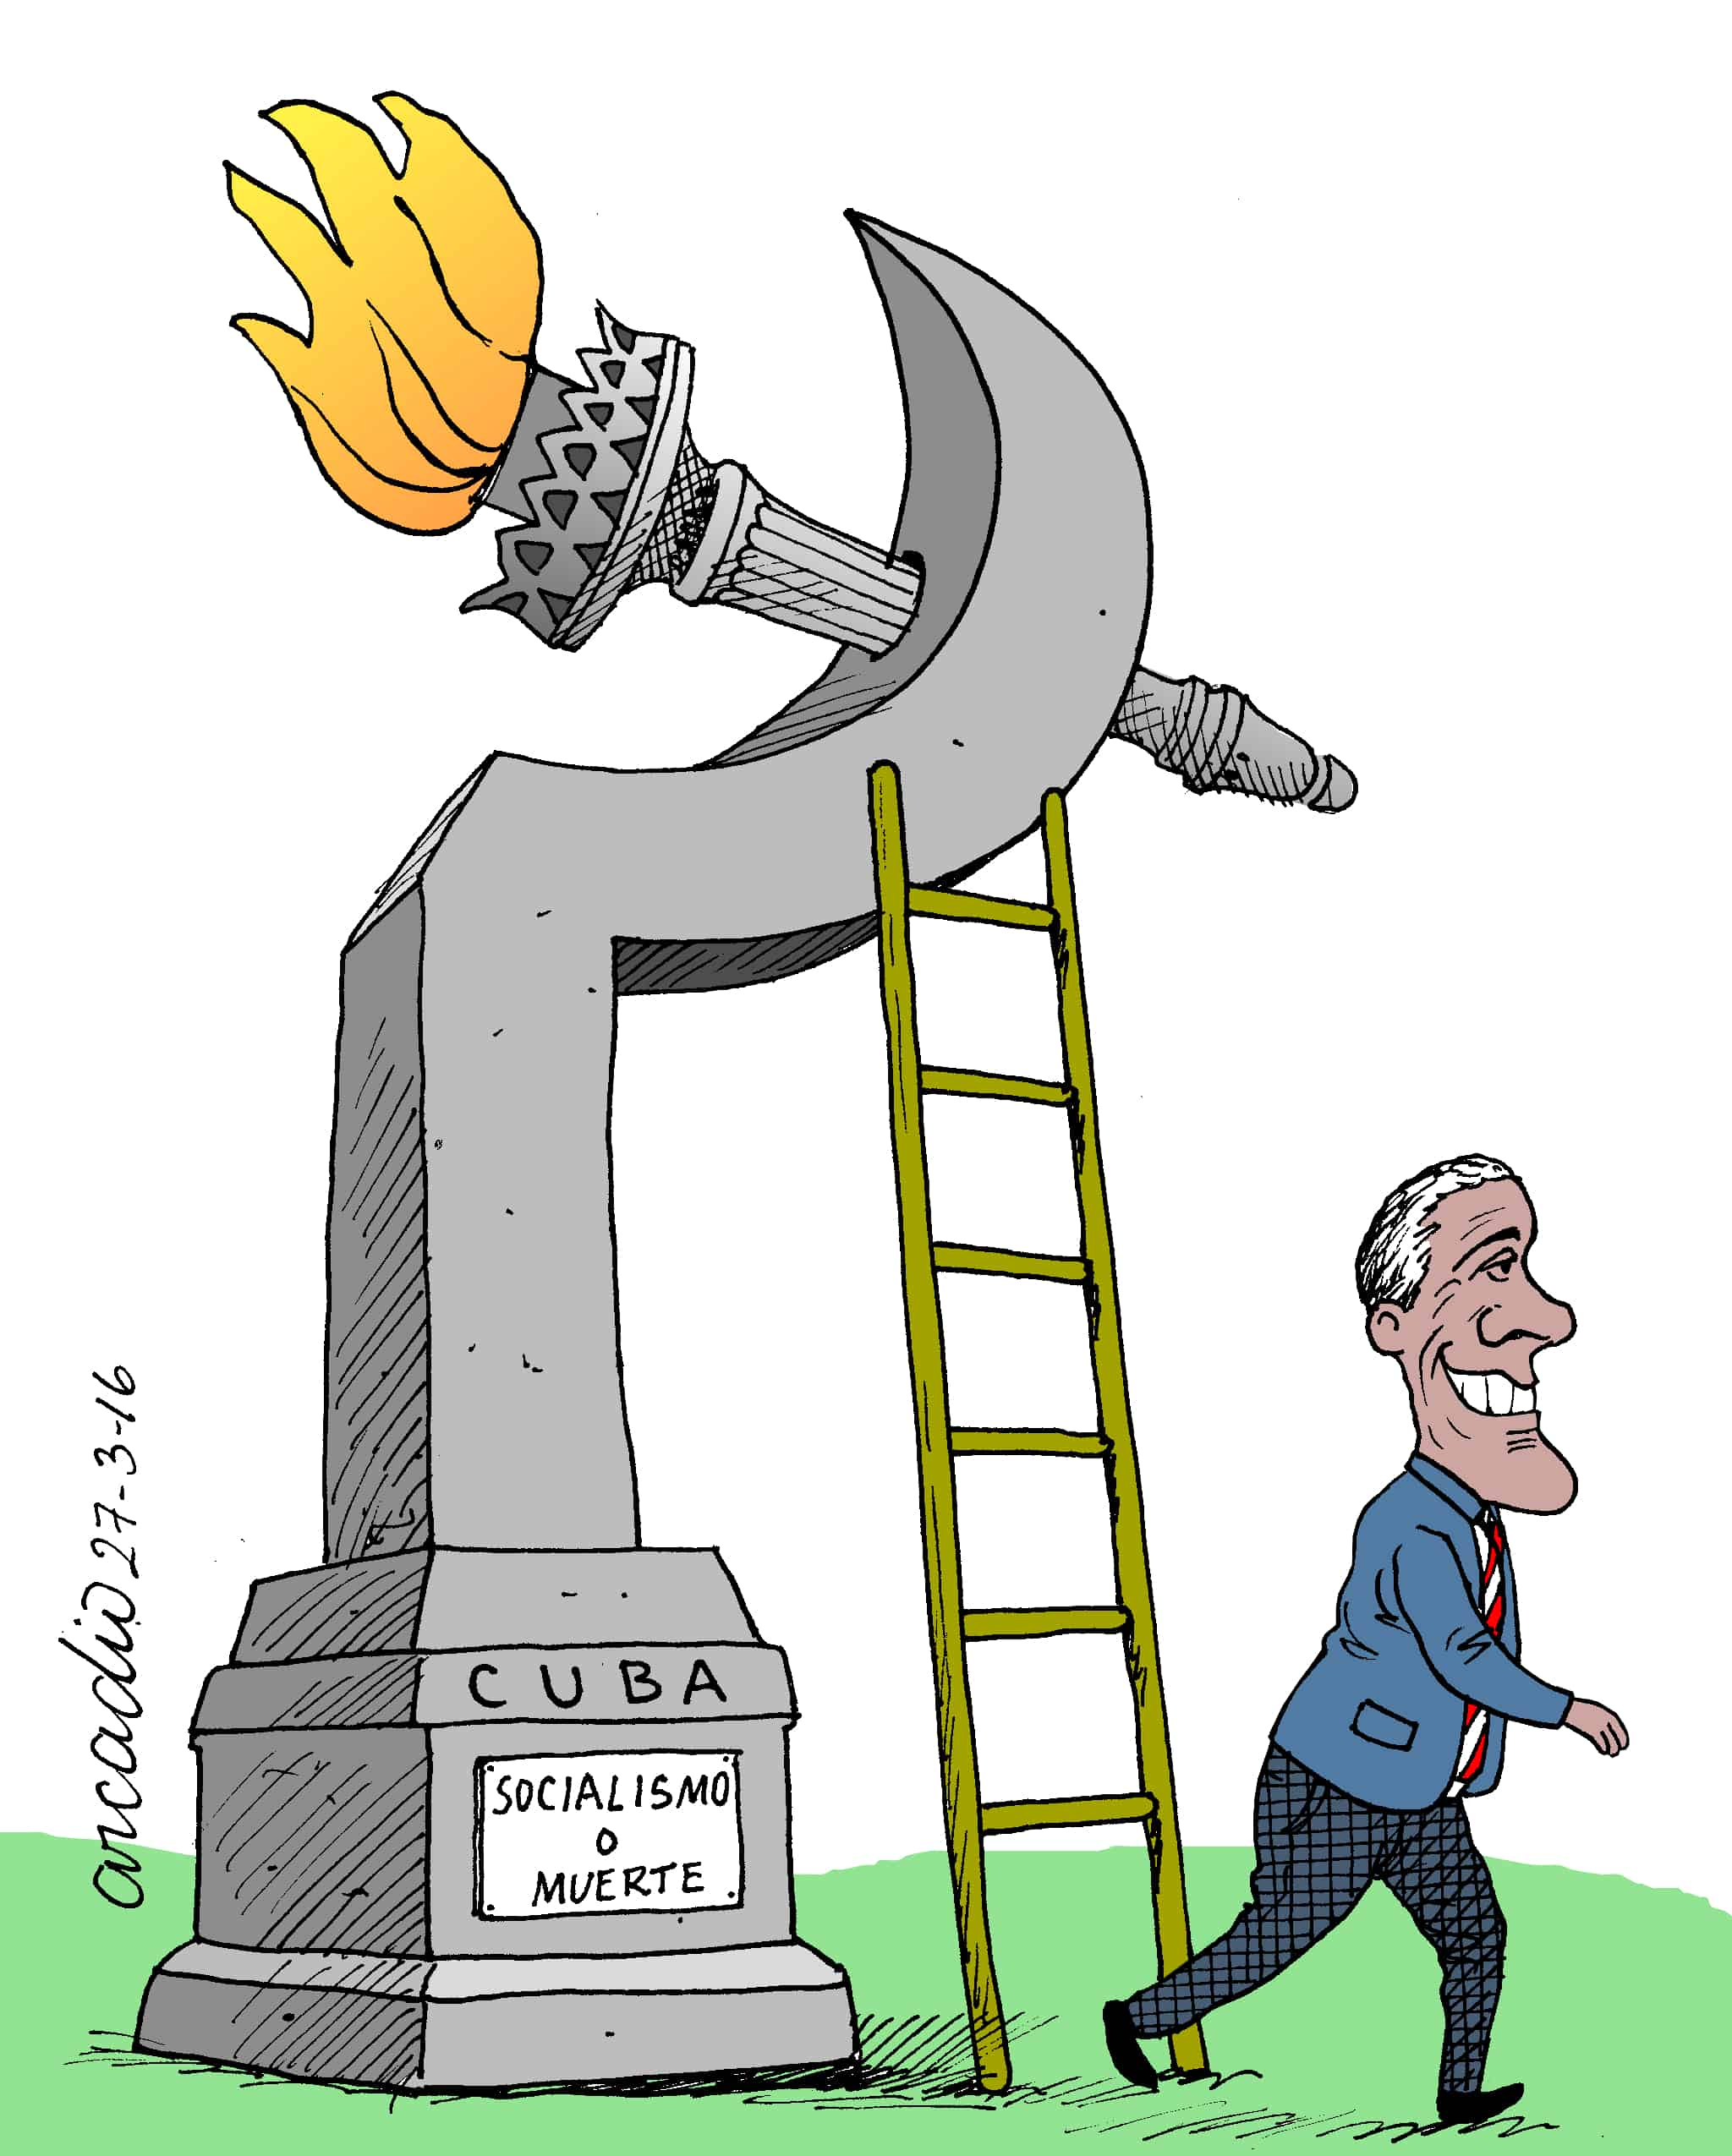 Arcadio cartoon on Obama in Cuba